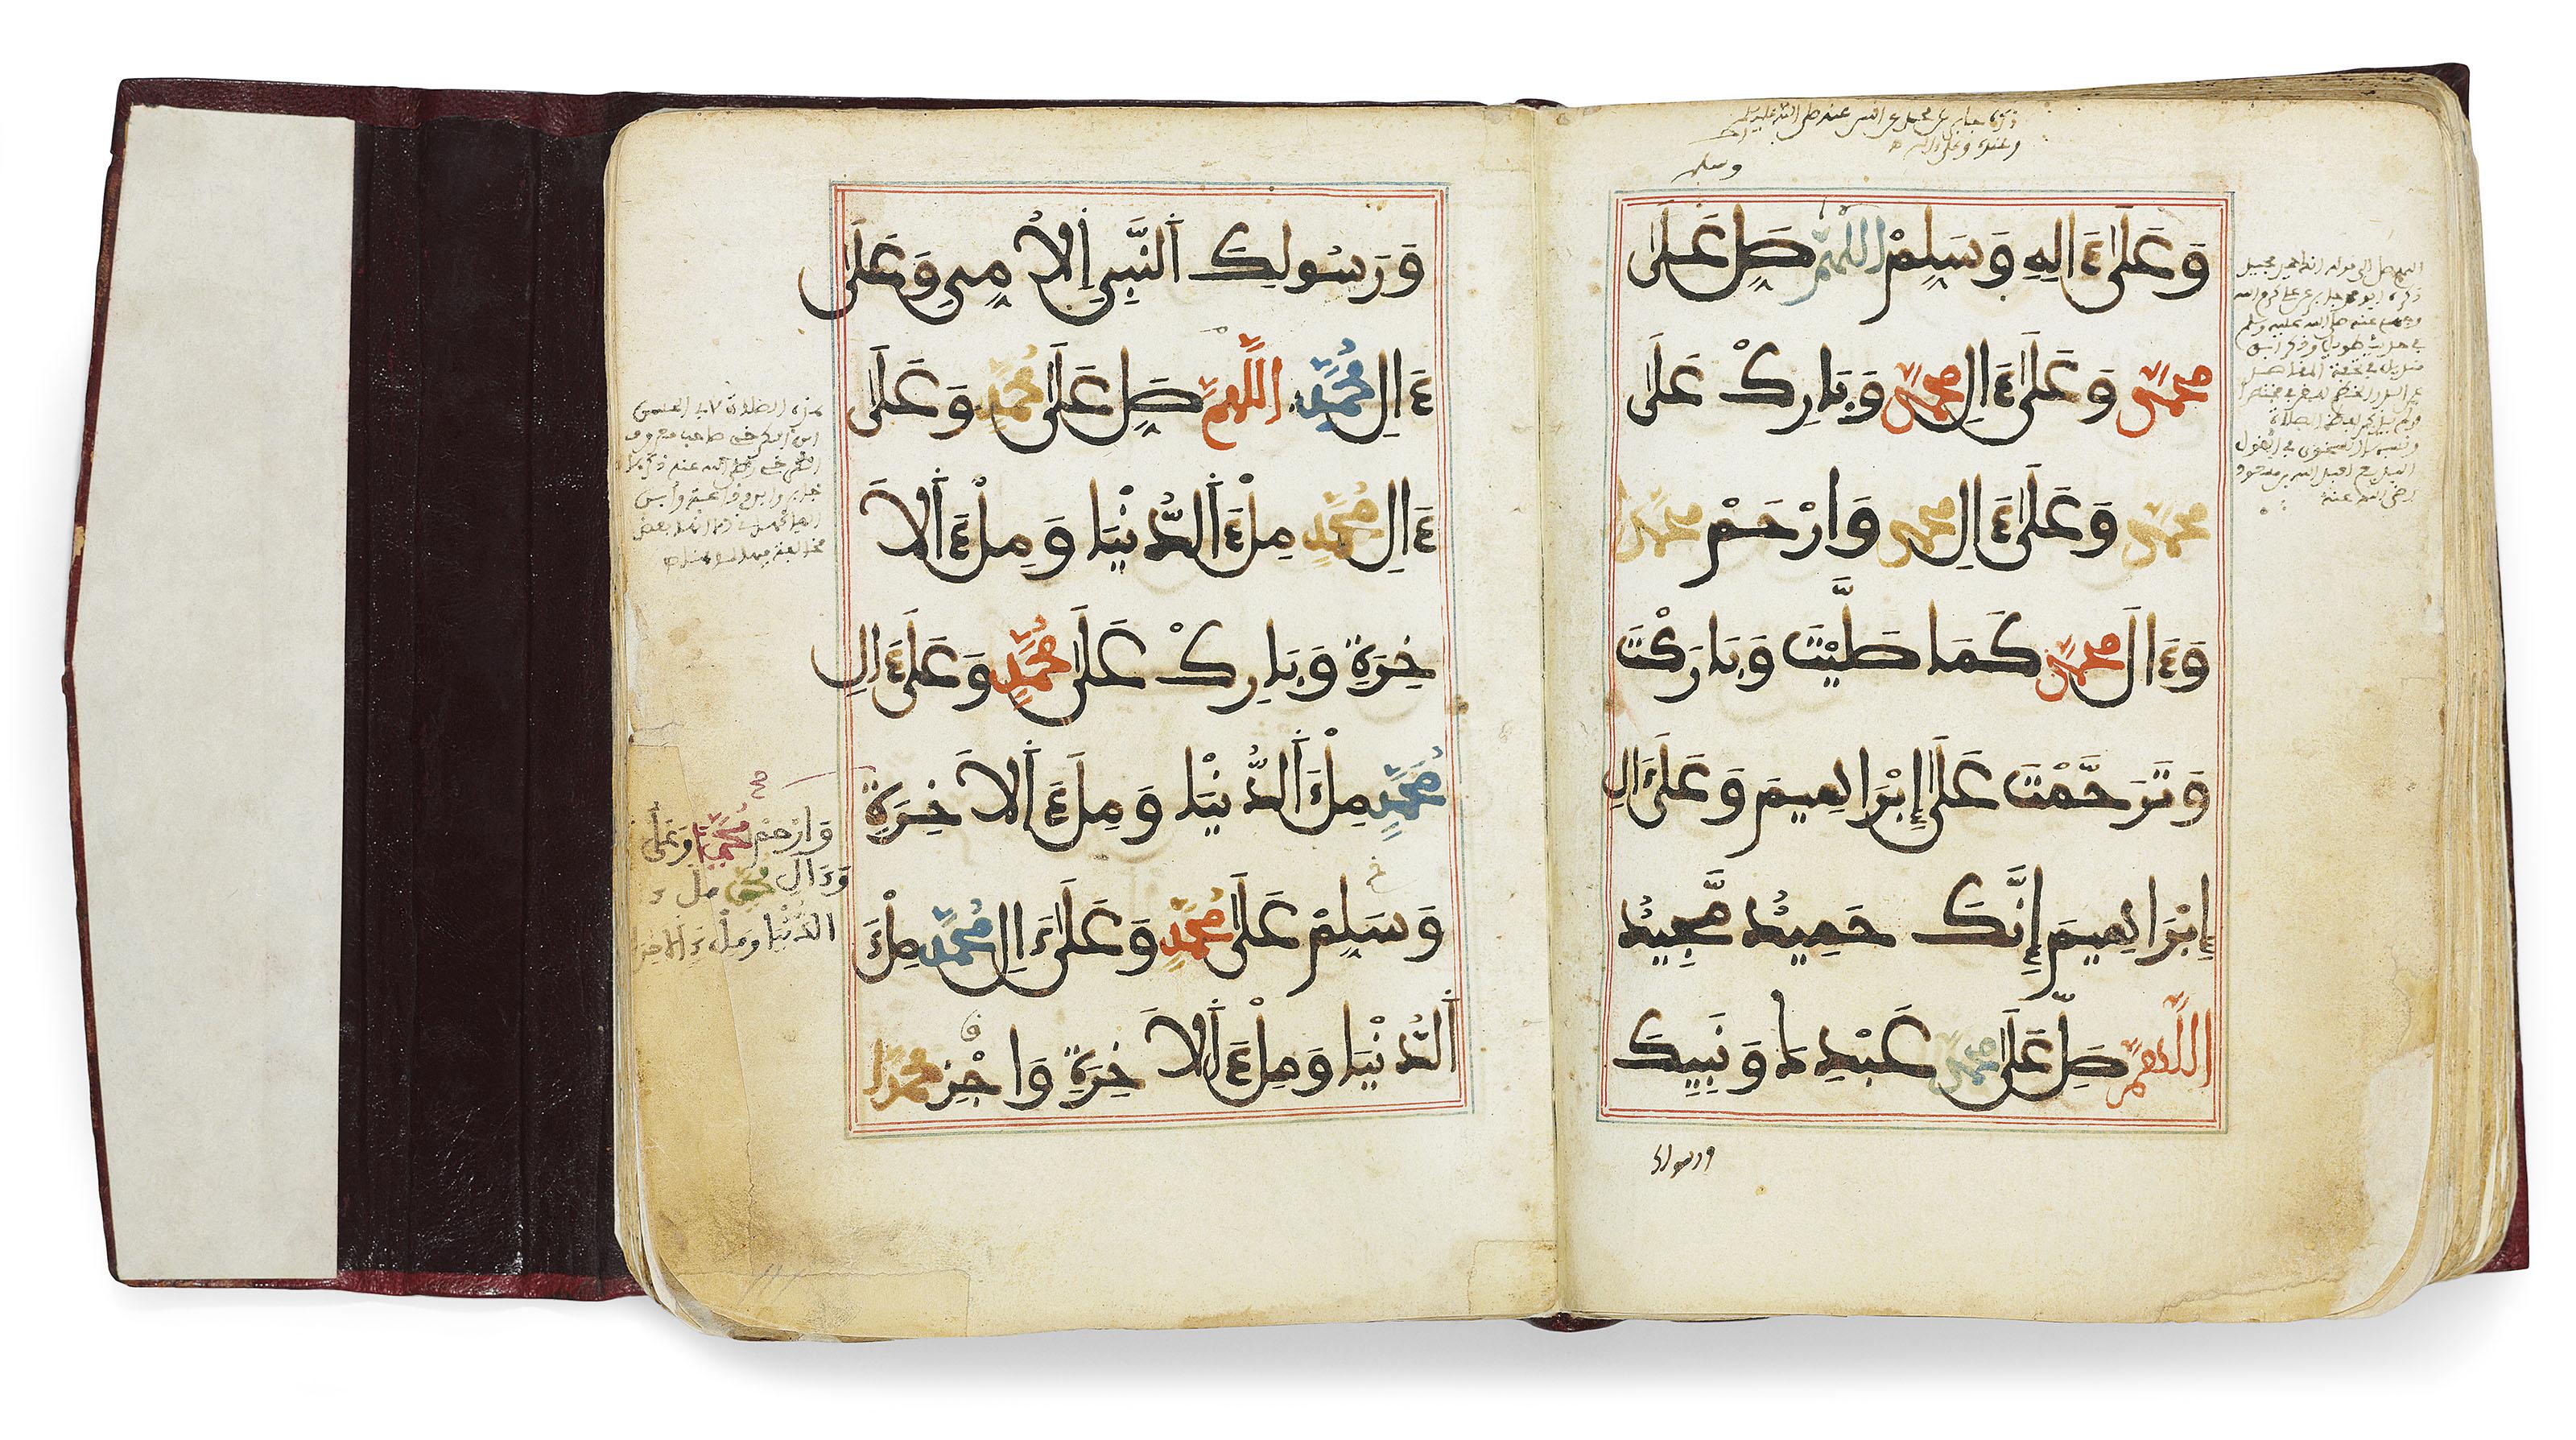 MUHAMMAD BIN SULAYMAN AL-JAZULI (D.1465 AD): DALA'IL AL-KHAYRAT